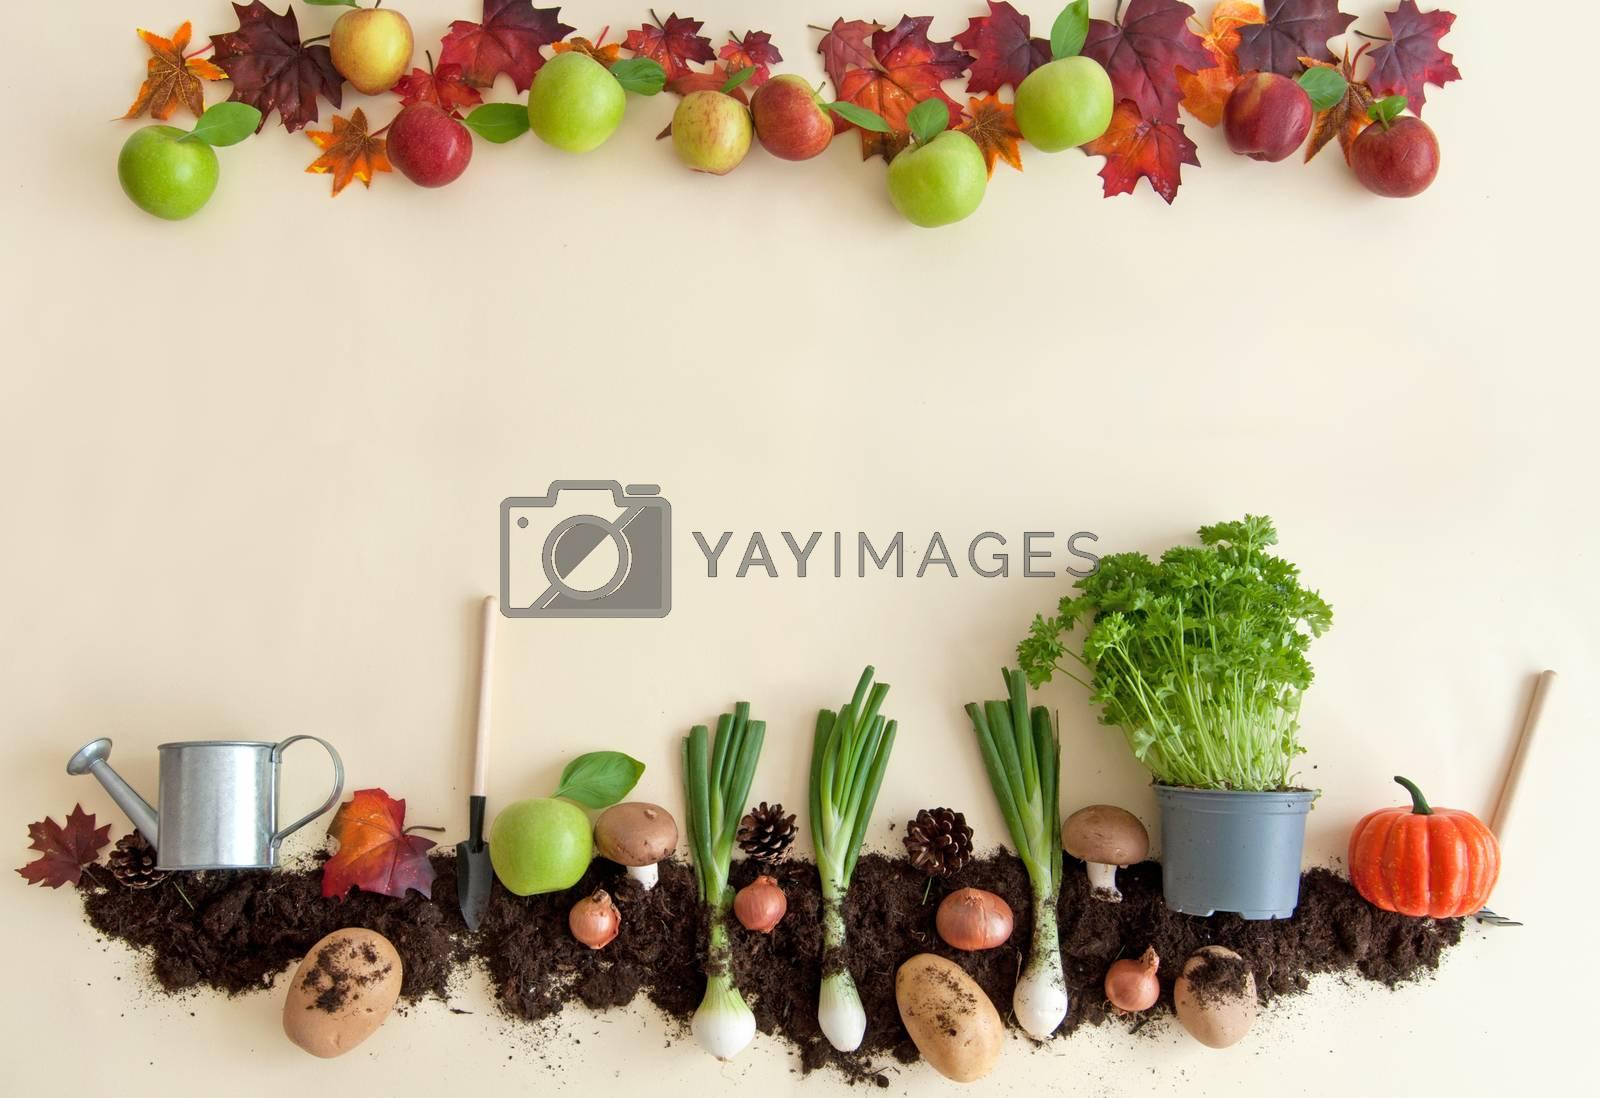 Royalty free image of Autumn harvest background by unikpix